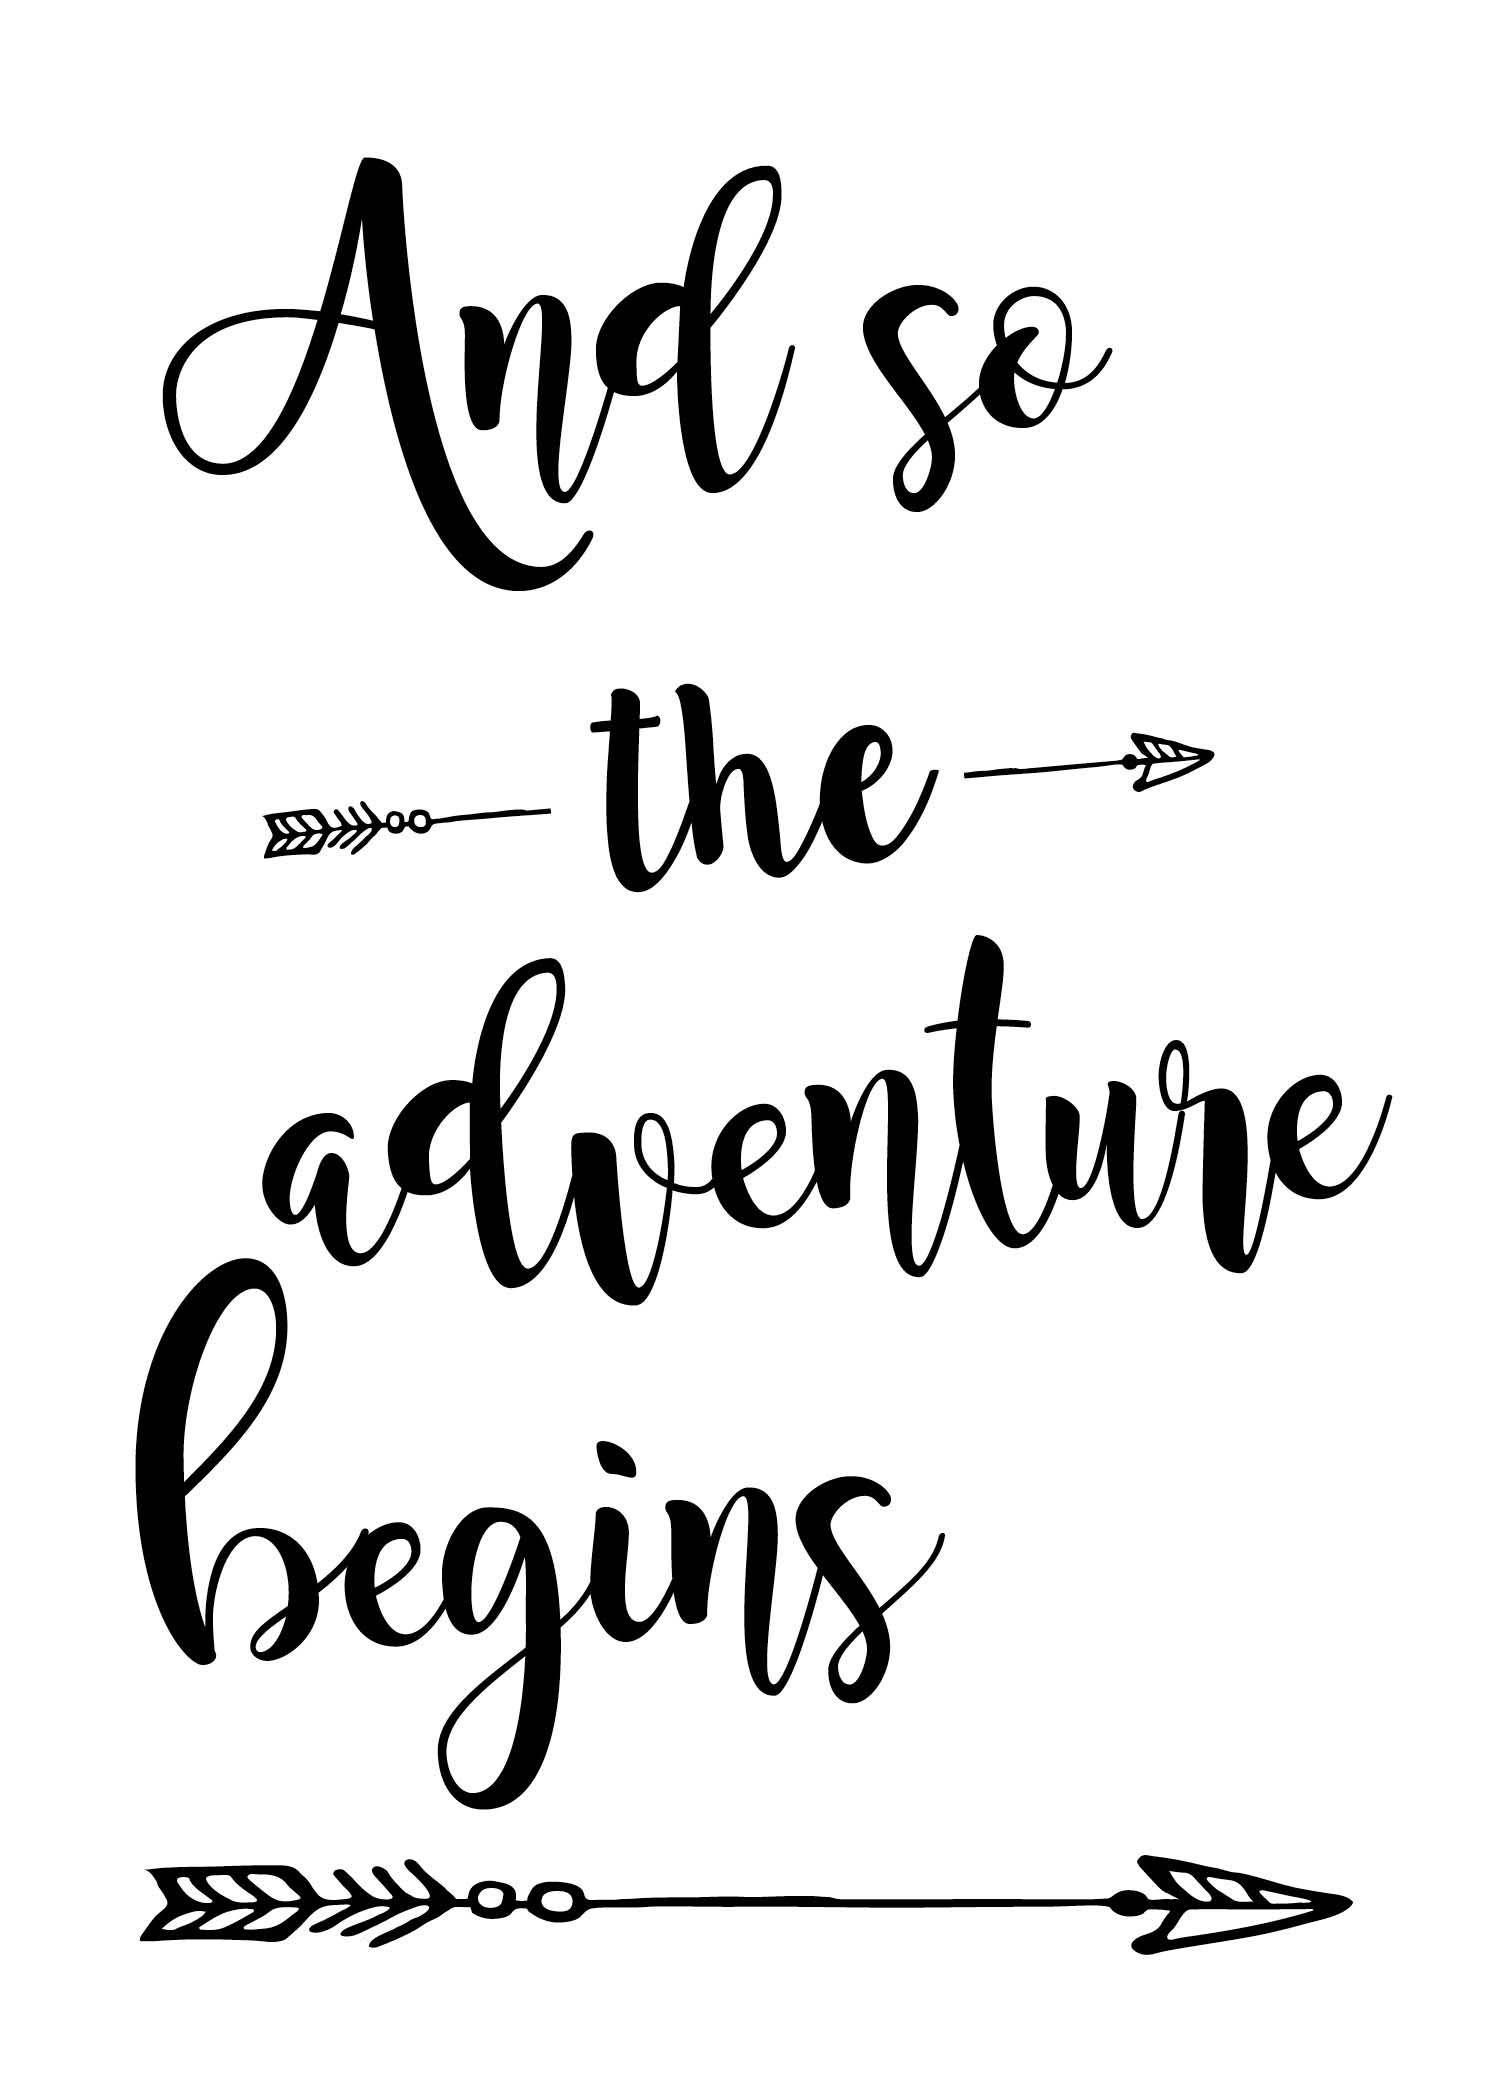 So the adventure begins2